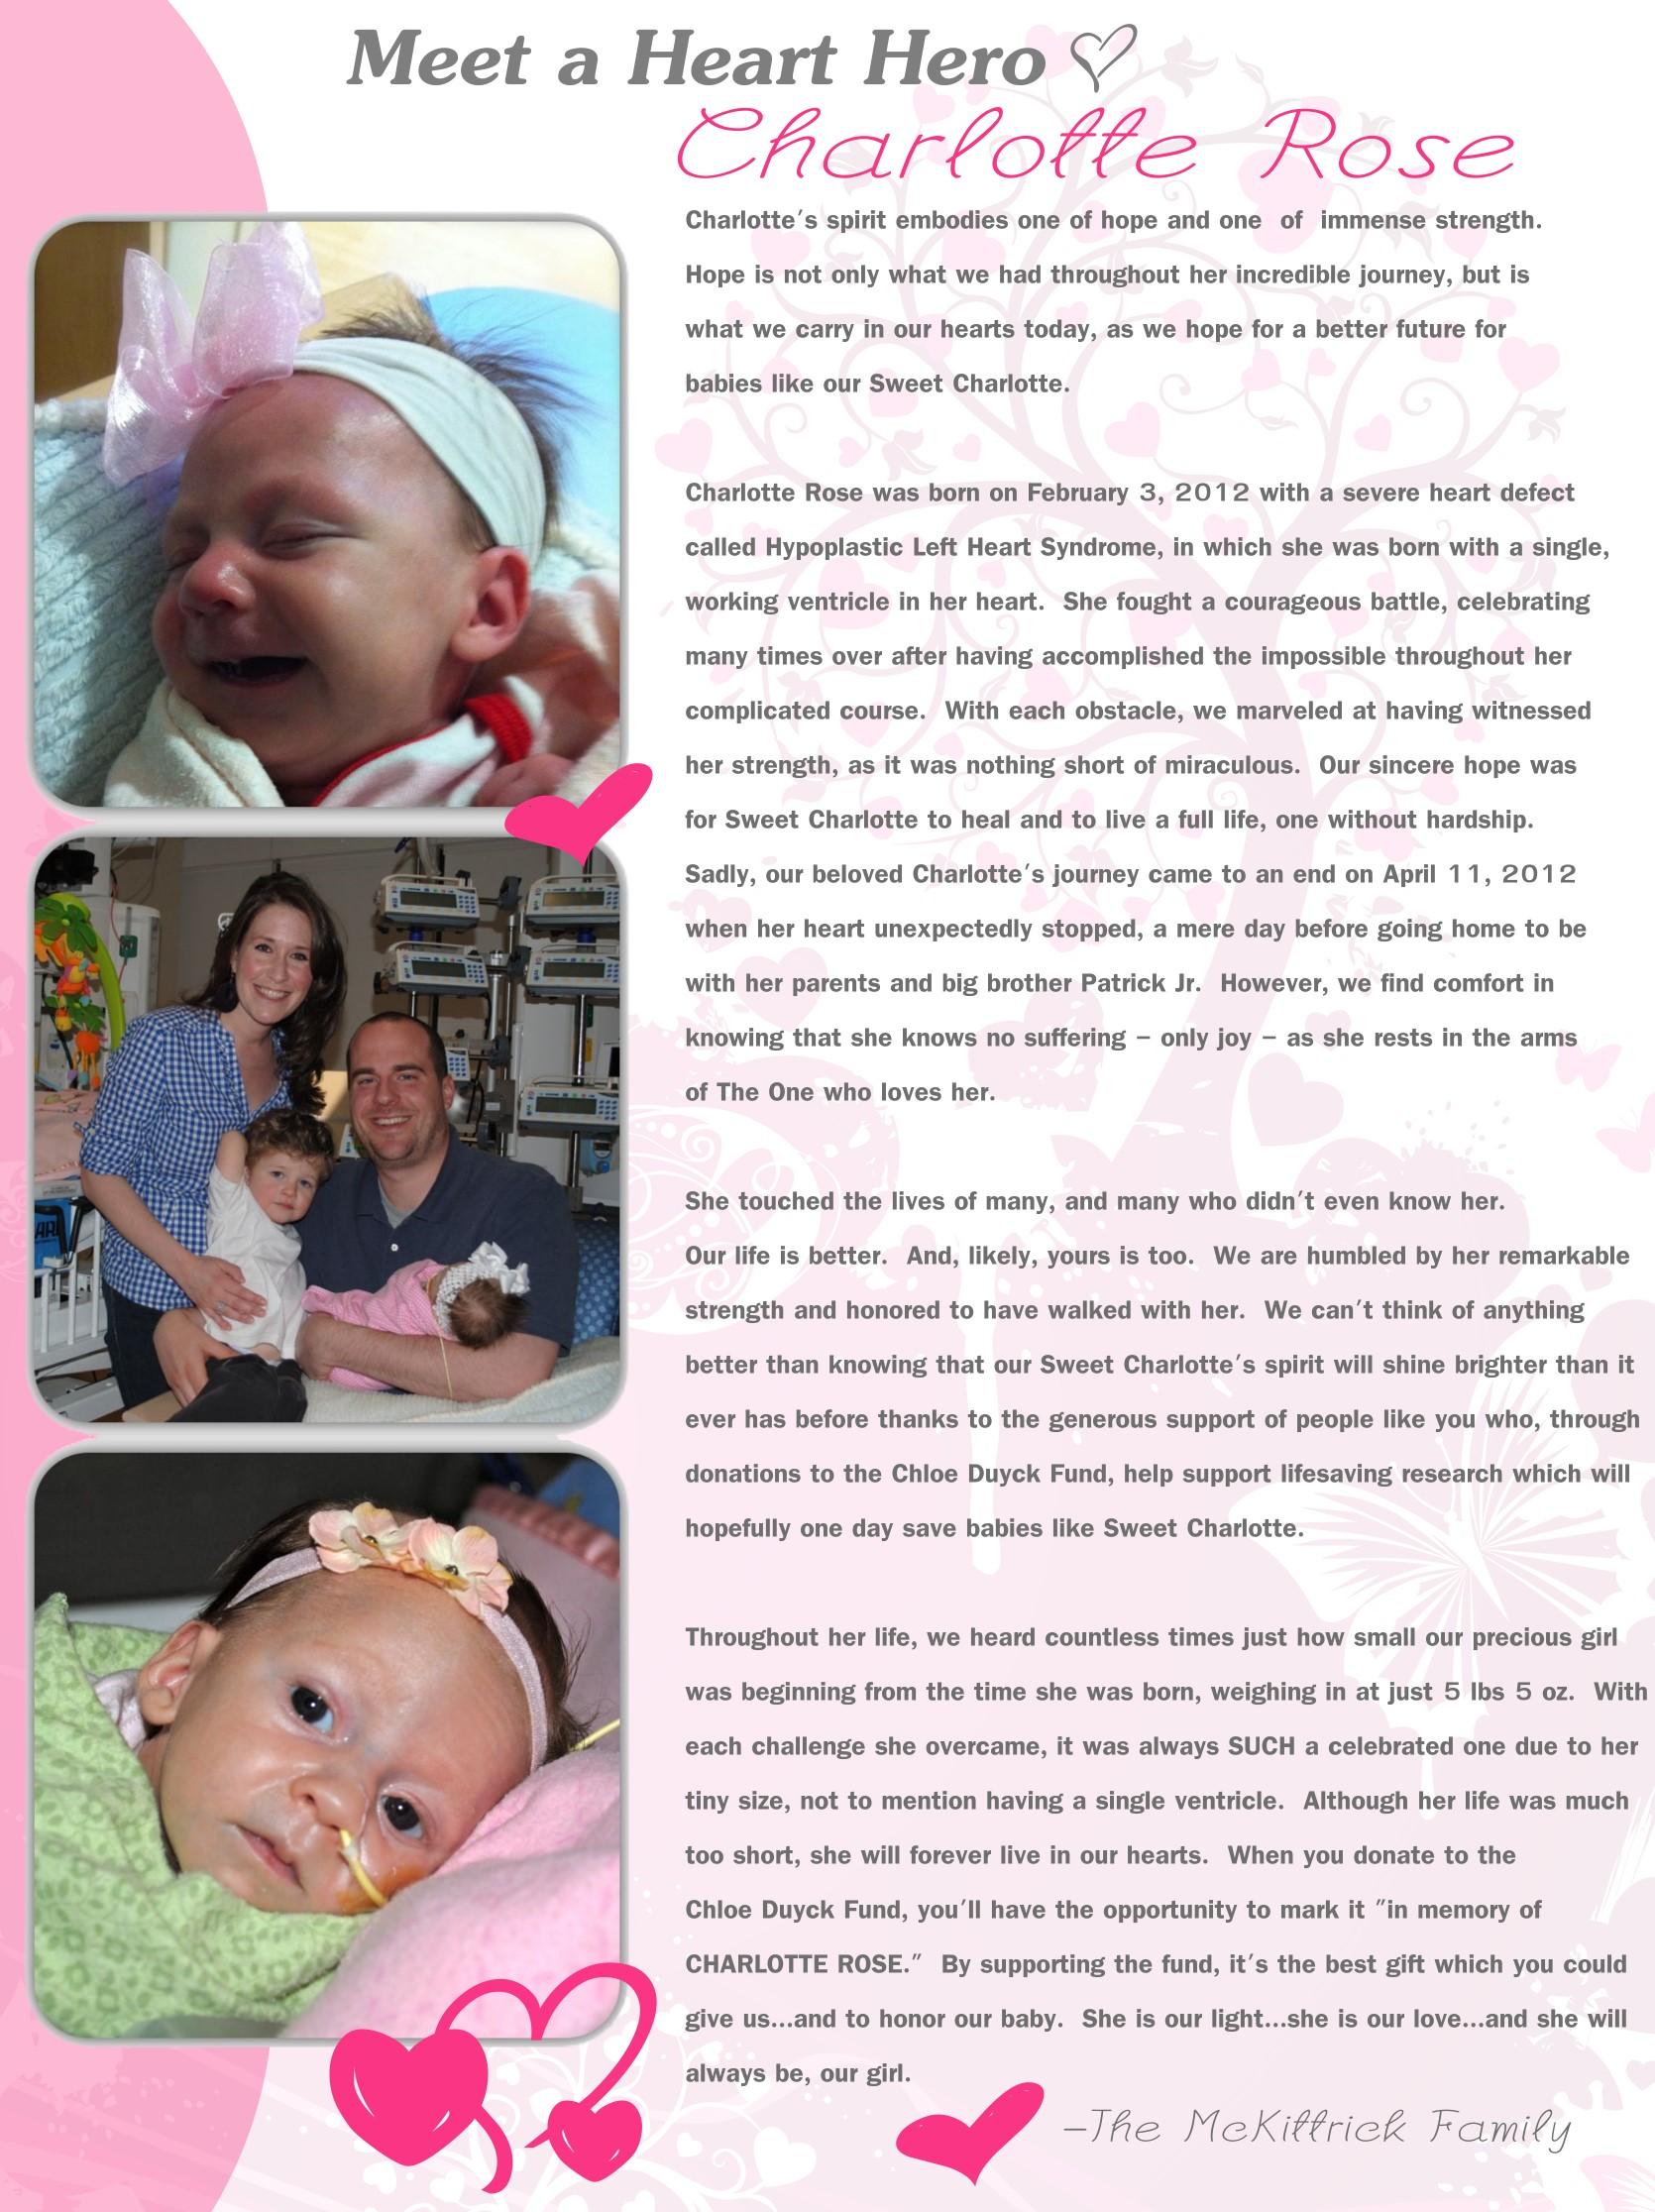 Meet a Heart Hero, Charlotte Rose